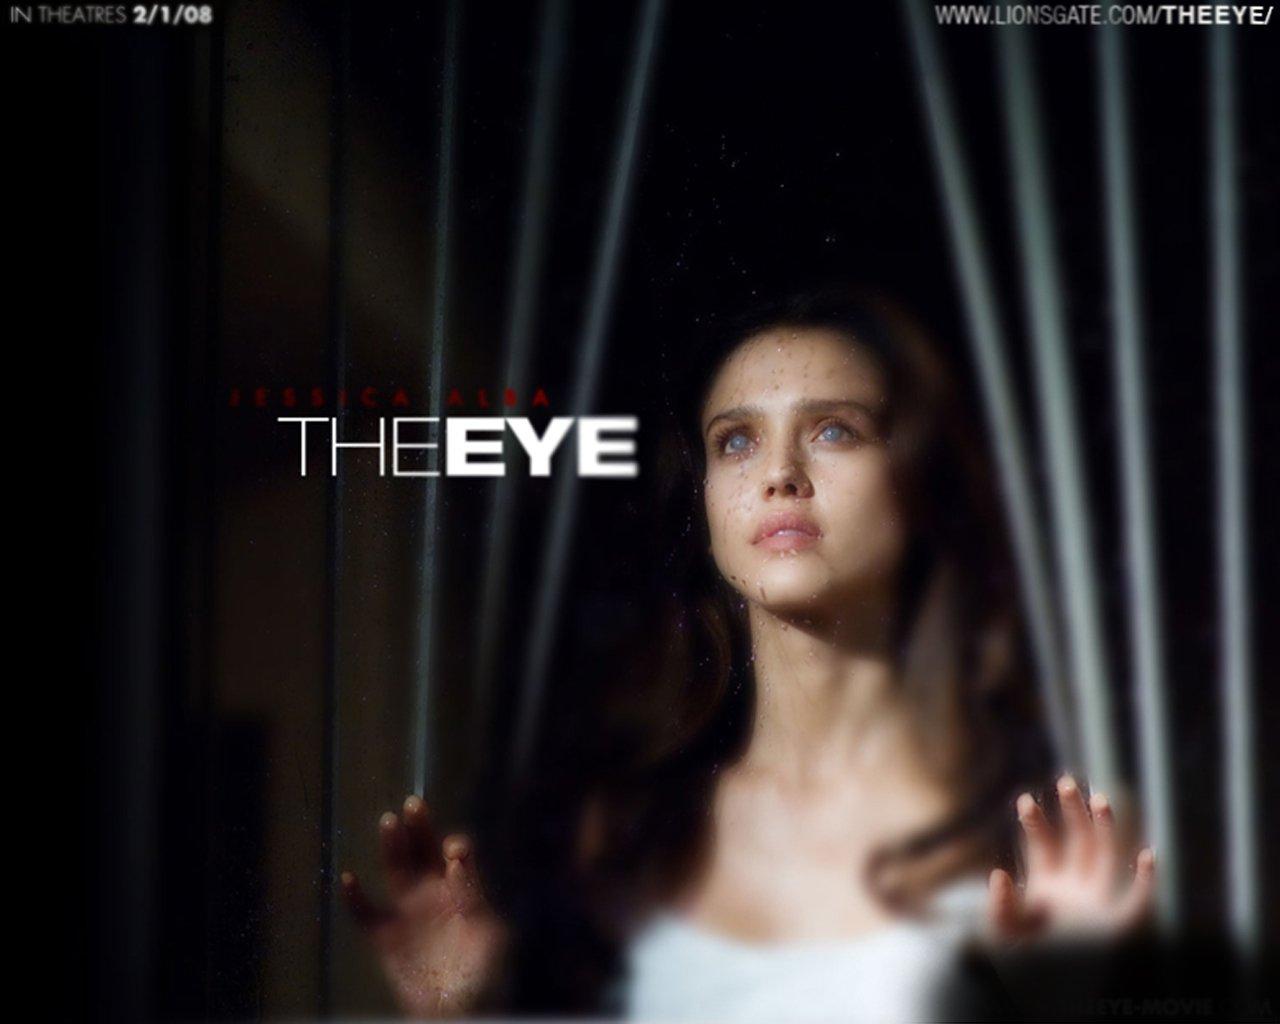 07957_The_Eye_Wallpaper_1280_003_122_579lo.jpg